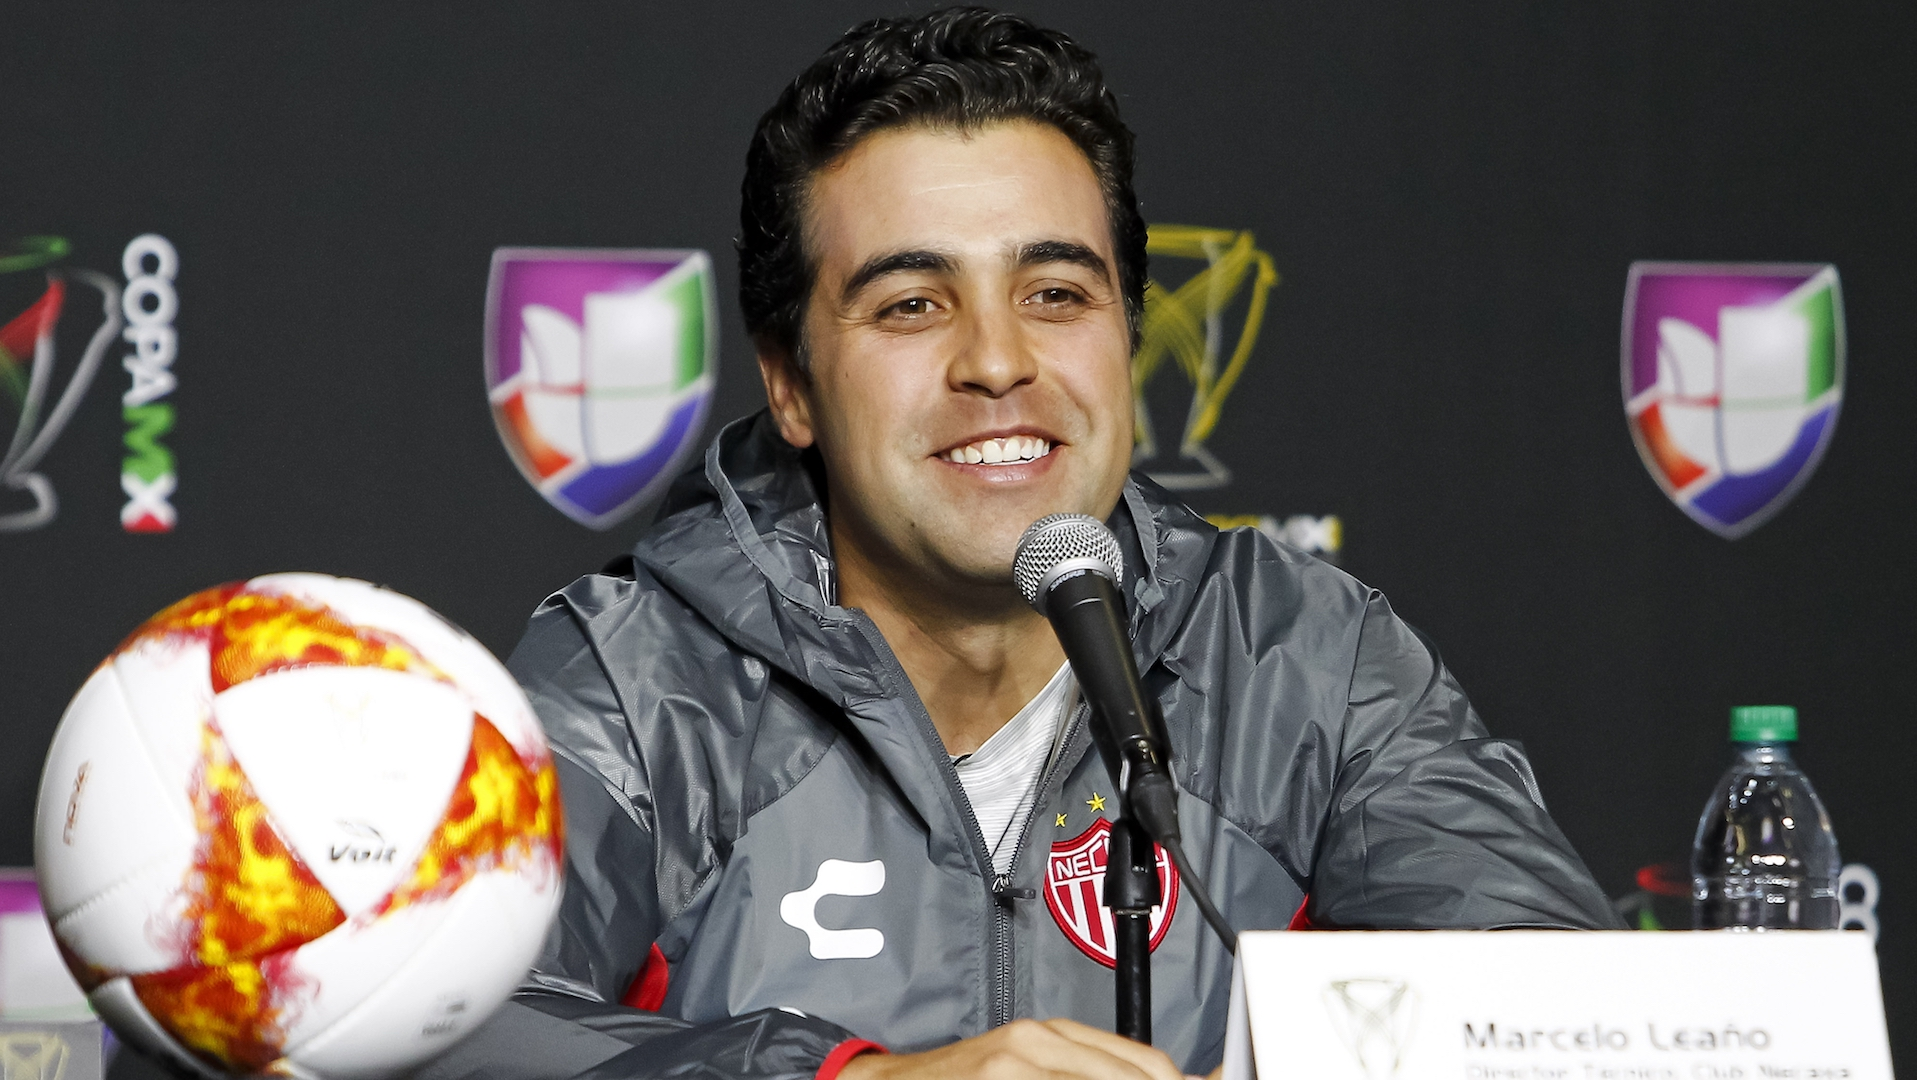 En caída libre, Necaxa cesó a Michel Leaño como DT